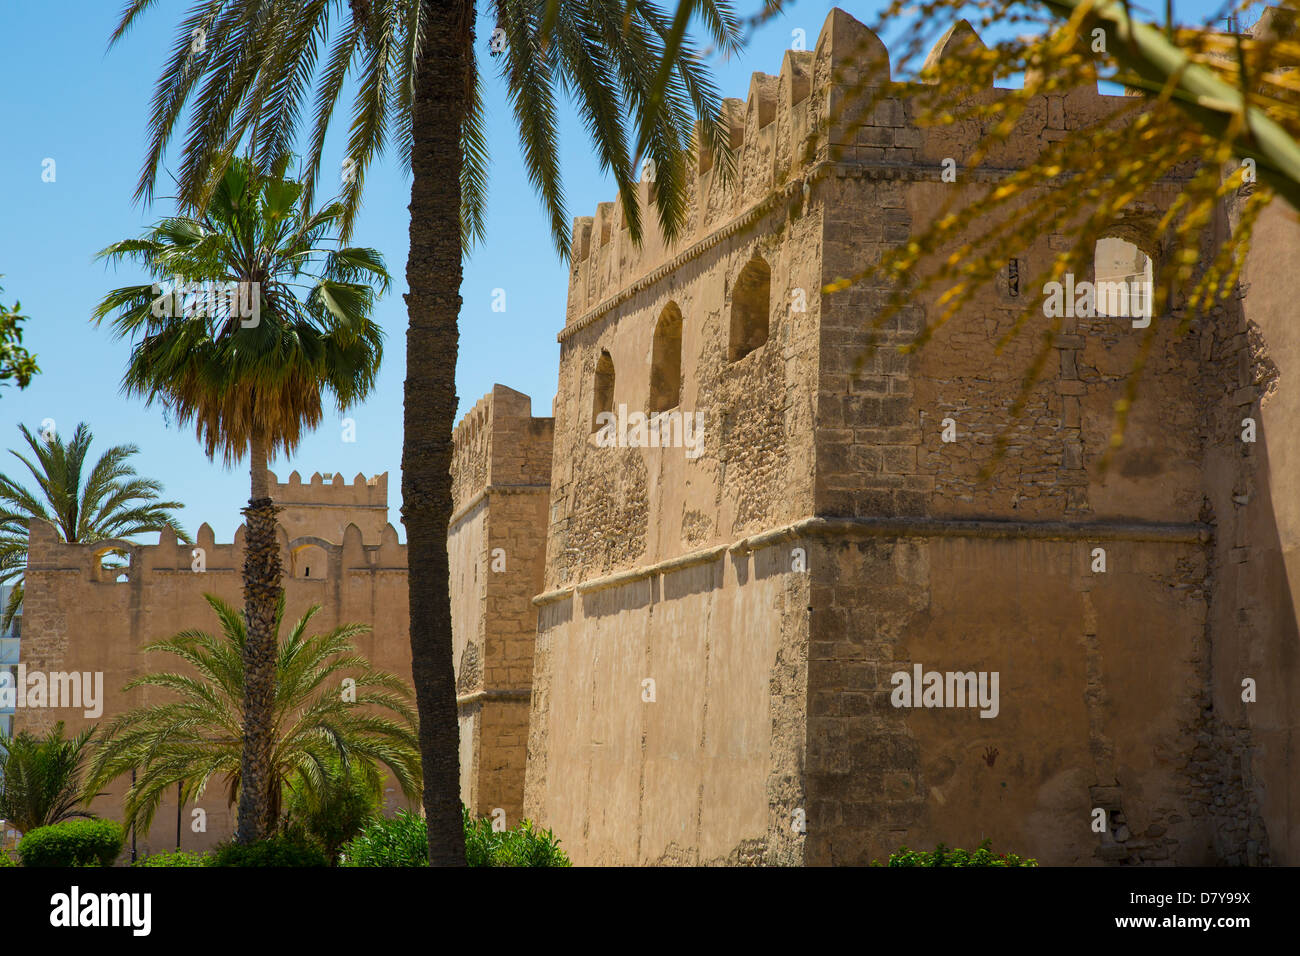 Walls of the Medina in Sfax Tunisia - Stock Image